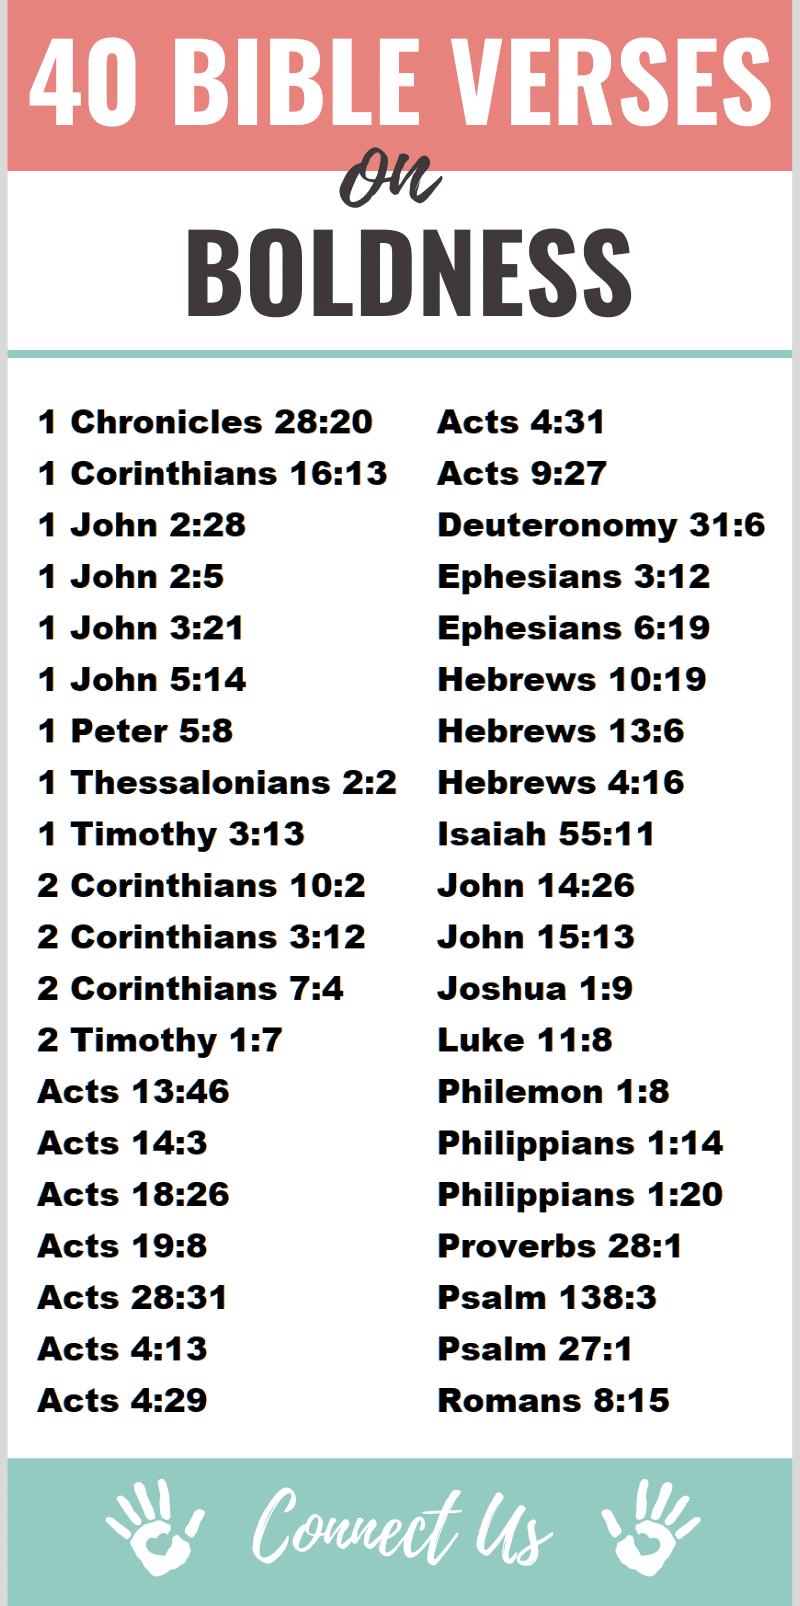 Bible Verses on Boldness